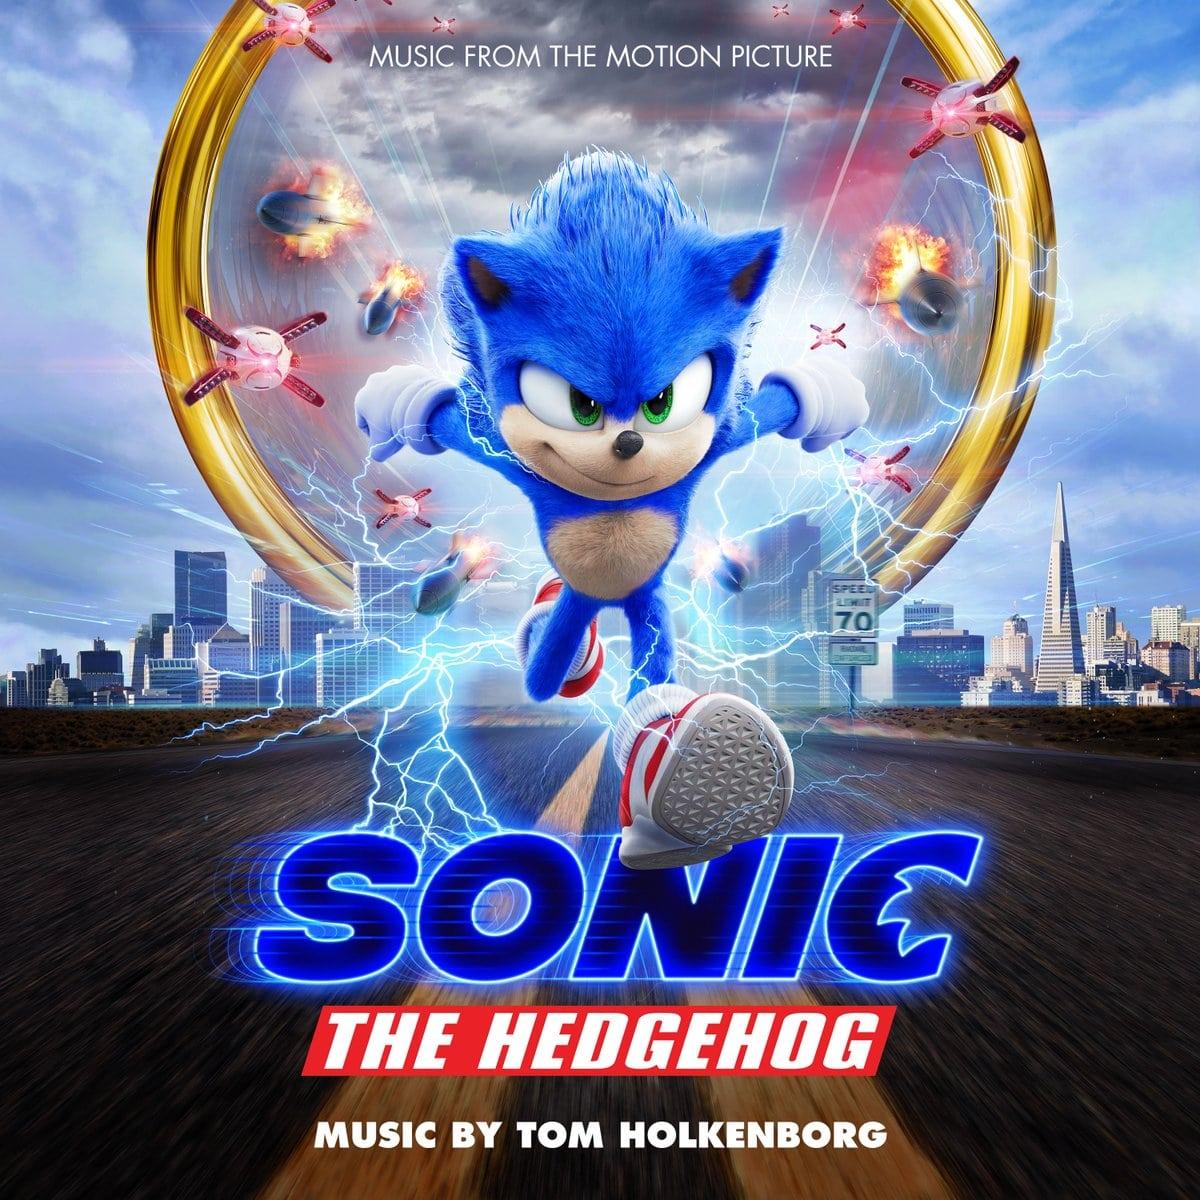 Junkie XL - Sonic The Hedgehog [Score of the Week]